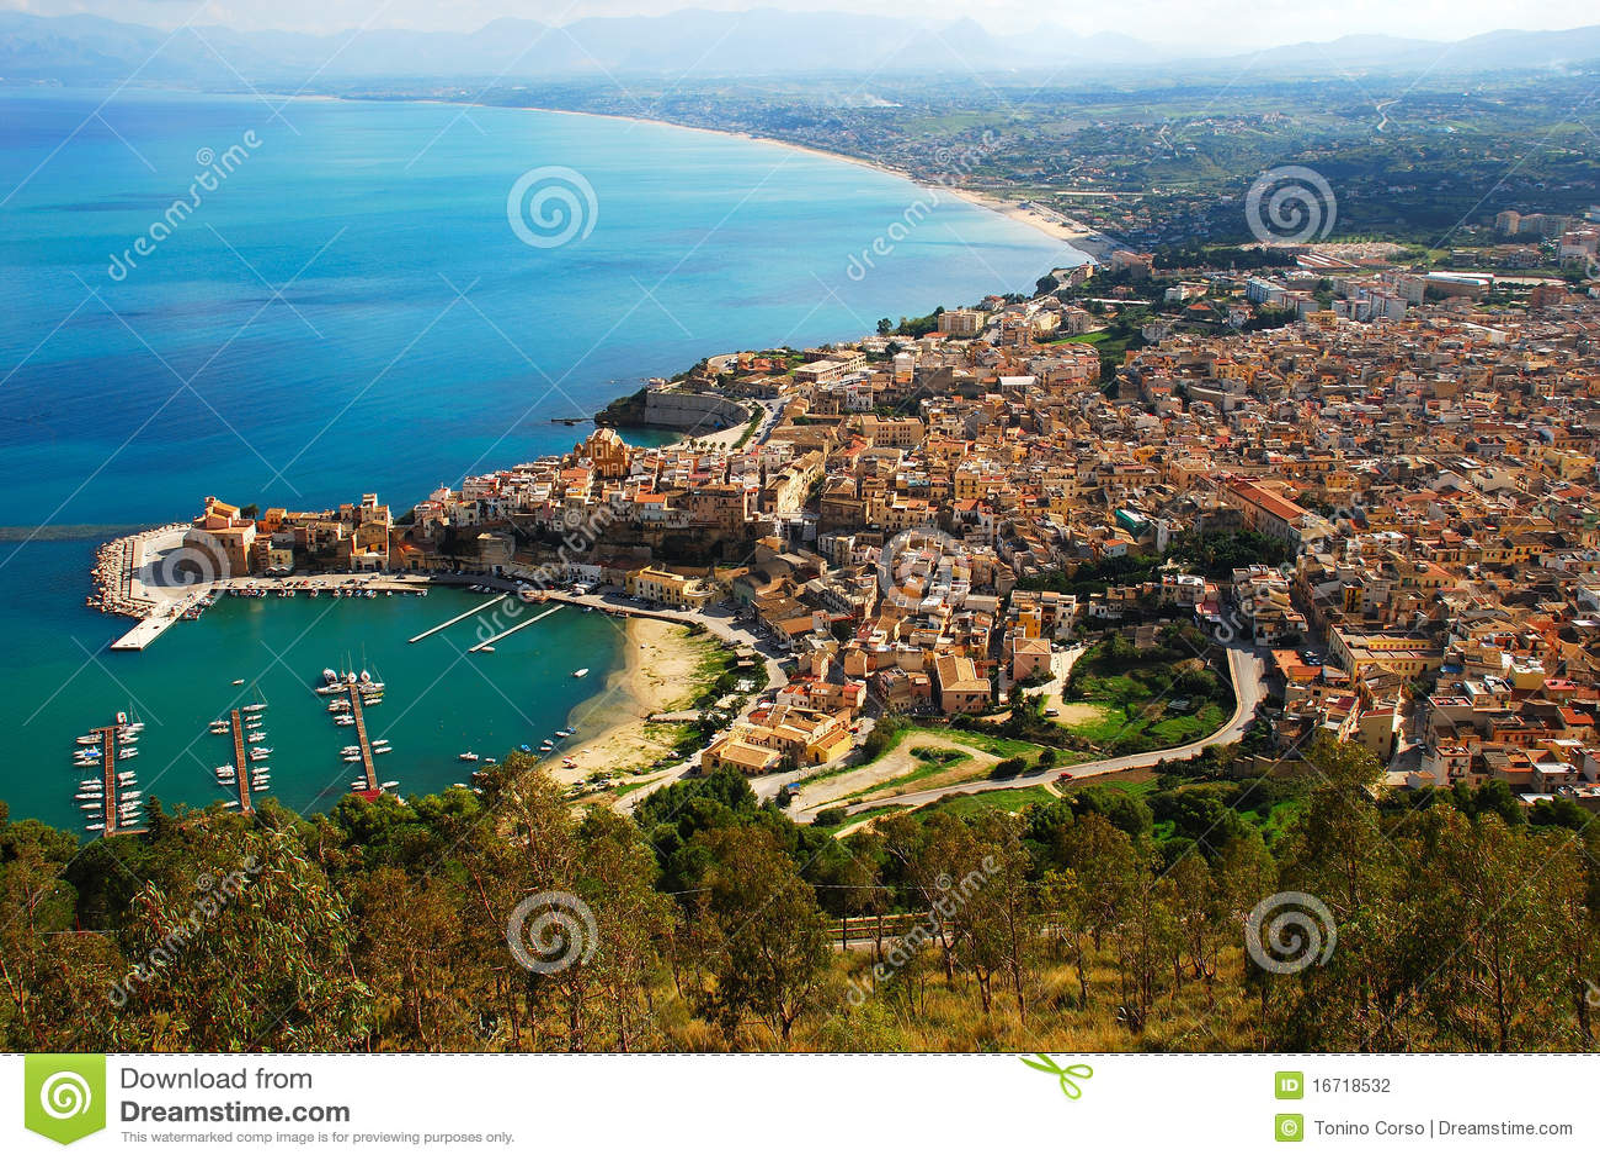 Castellammare del golfo sicily italy stock photo image 48782909 - Castellammare Del Golfo Sicily Stock Photography